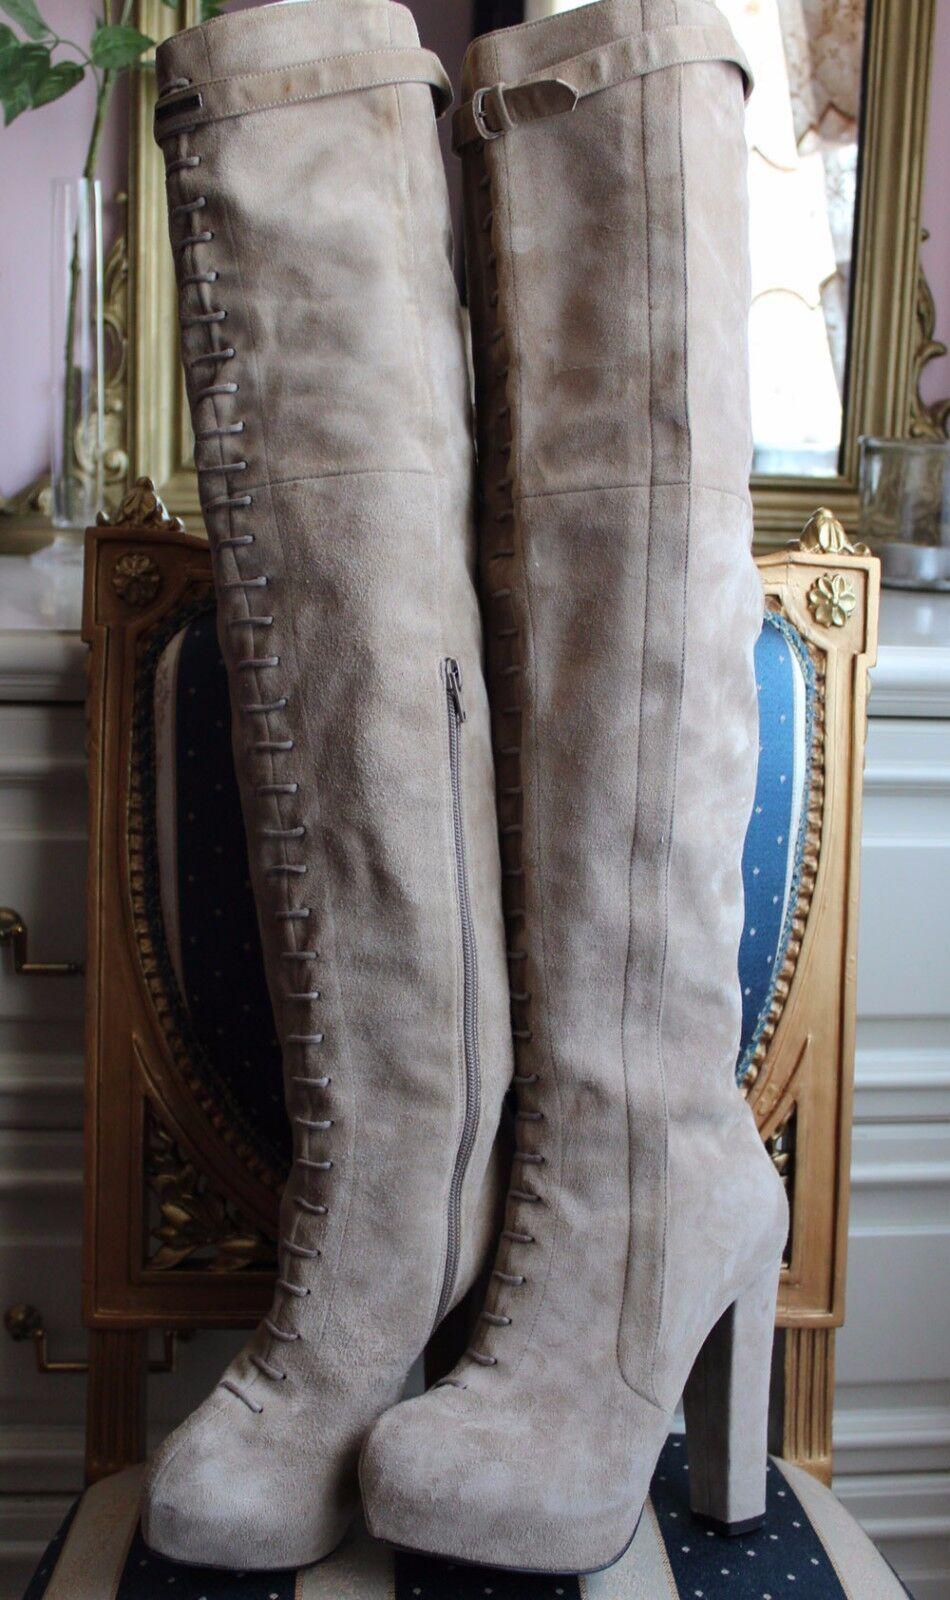 i nuovi stili più caldi Auth RICHMOND gothic beige suede high heels stivali over knee knee knee lenght 100% leather  prezzo all'ingrosso e qualità affidabile